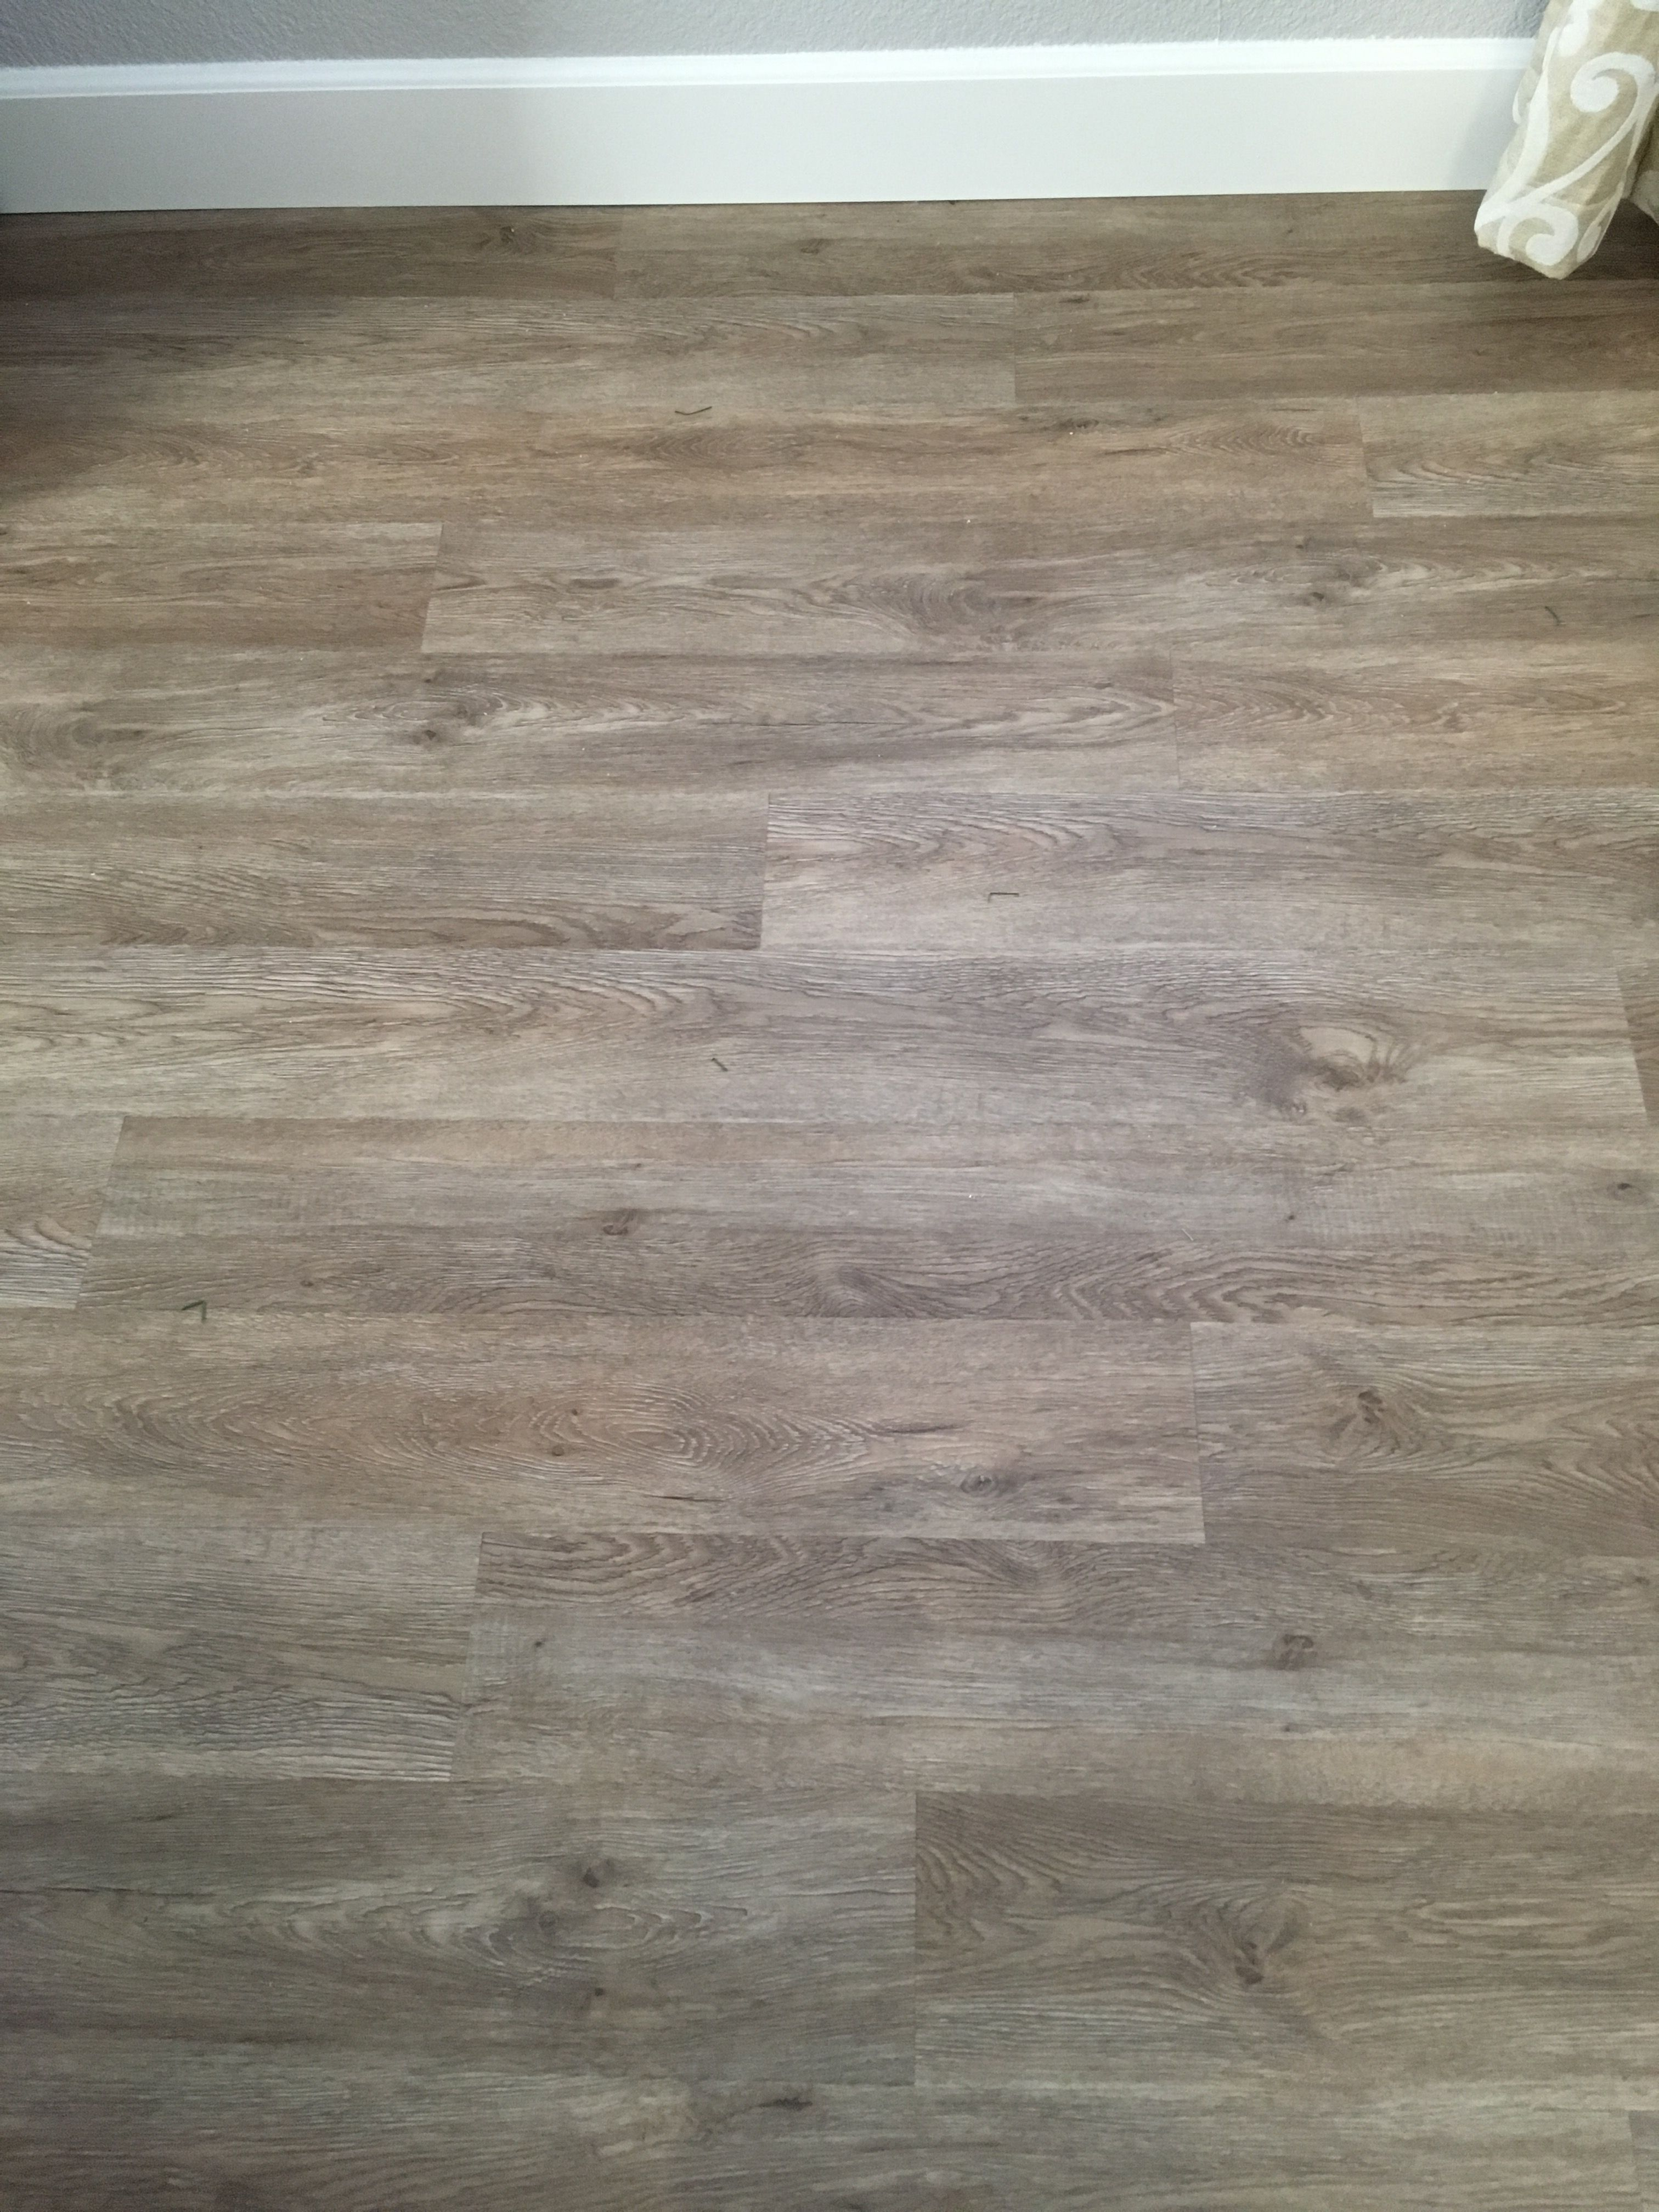 Our Floors Love Them Nucore Driftwood Oak Waterproof Vinyl Luxury